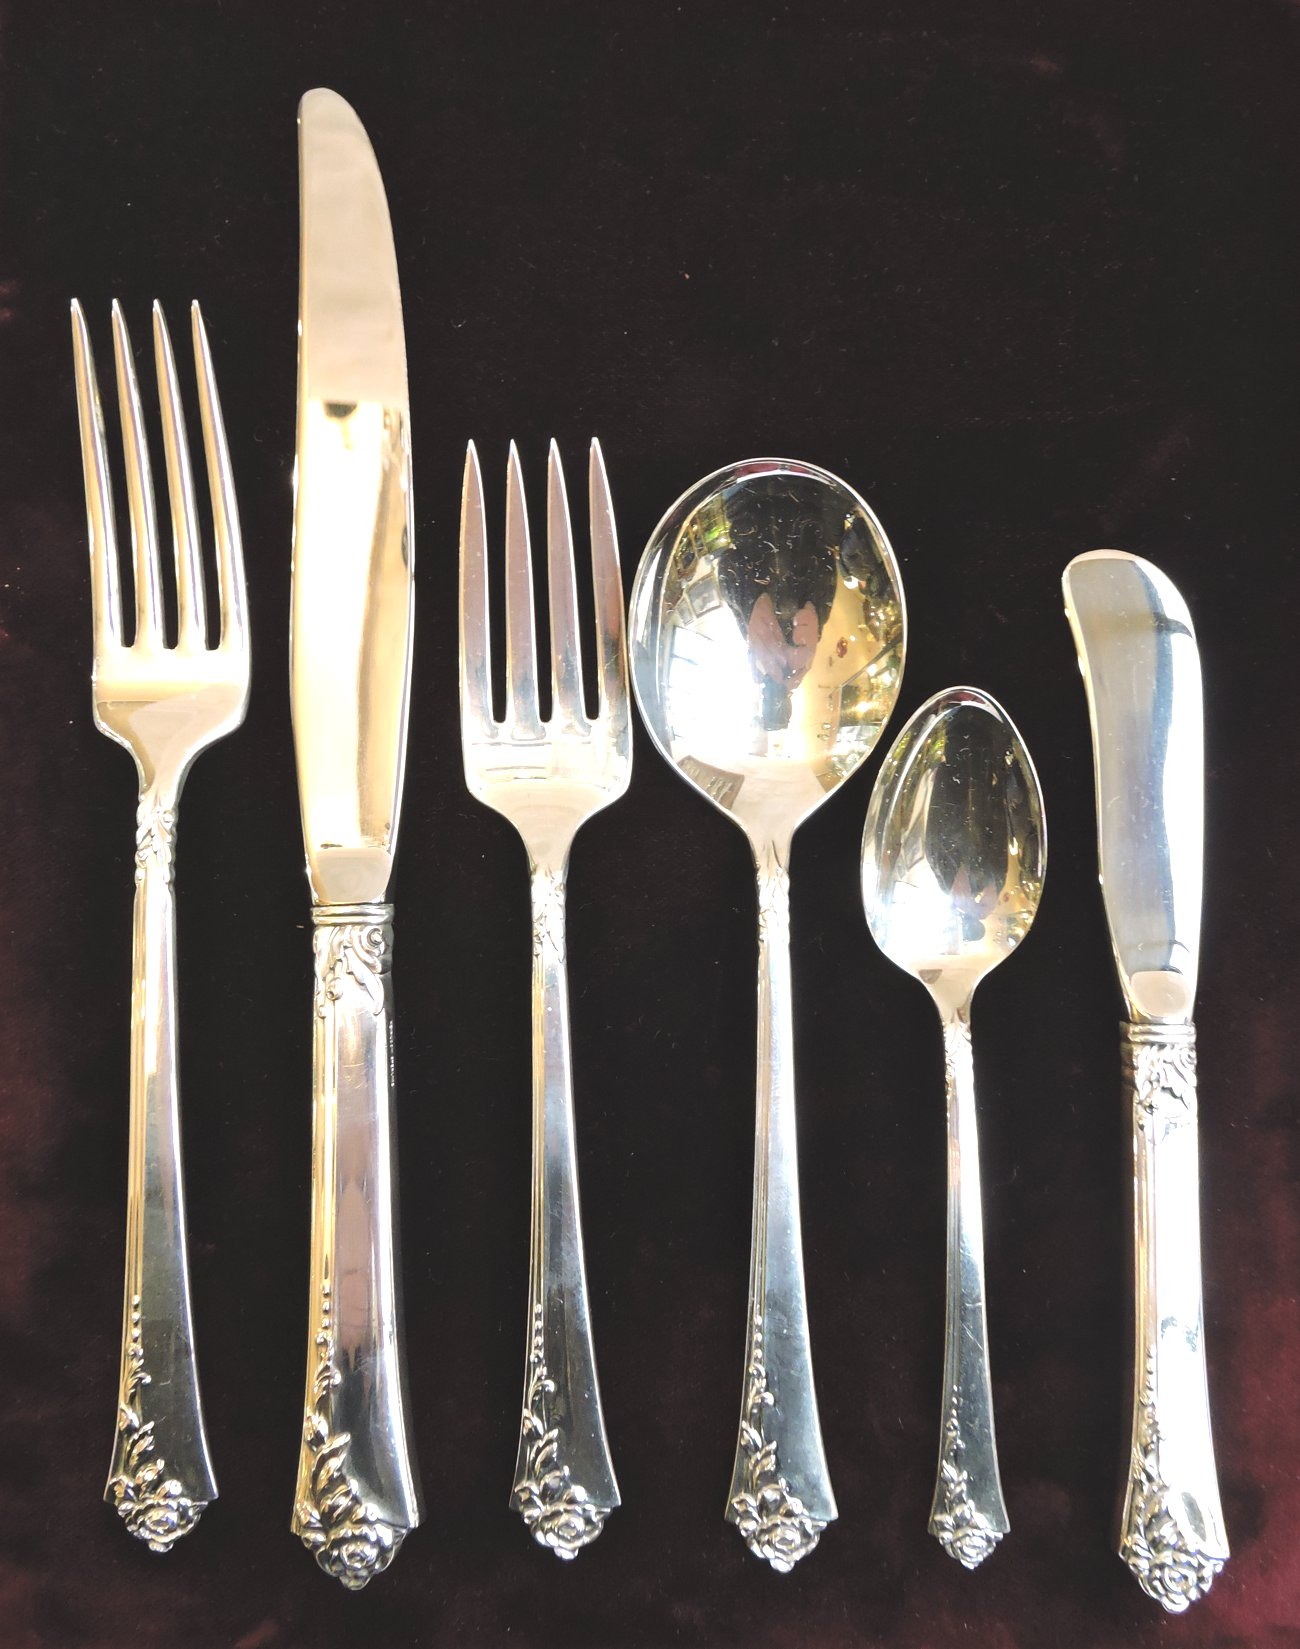 silverflatware - damaskroselunchset8-04.jpg